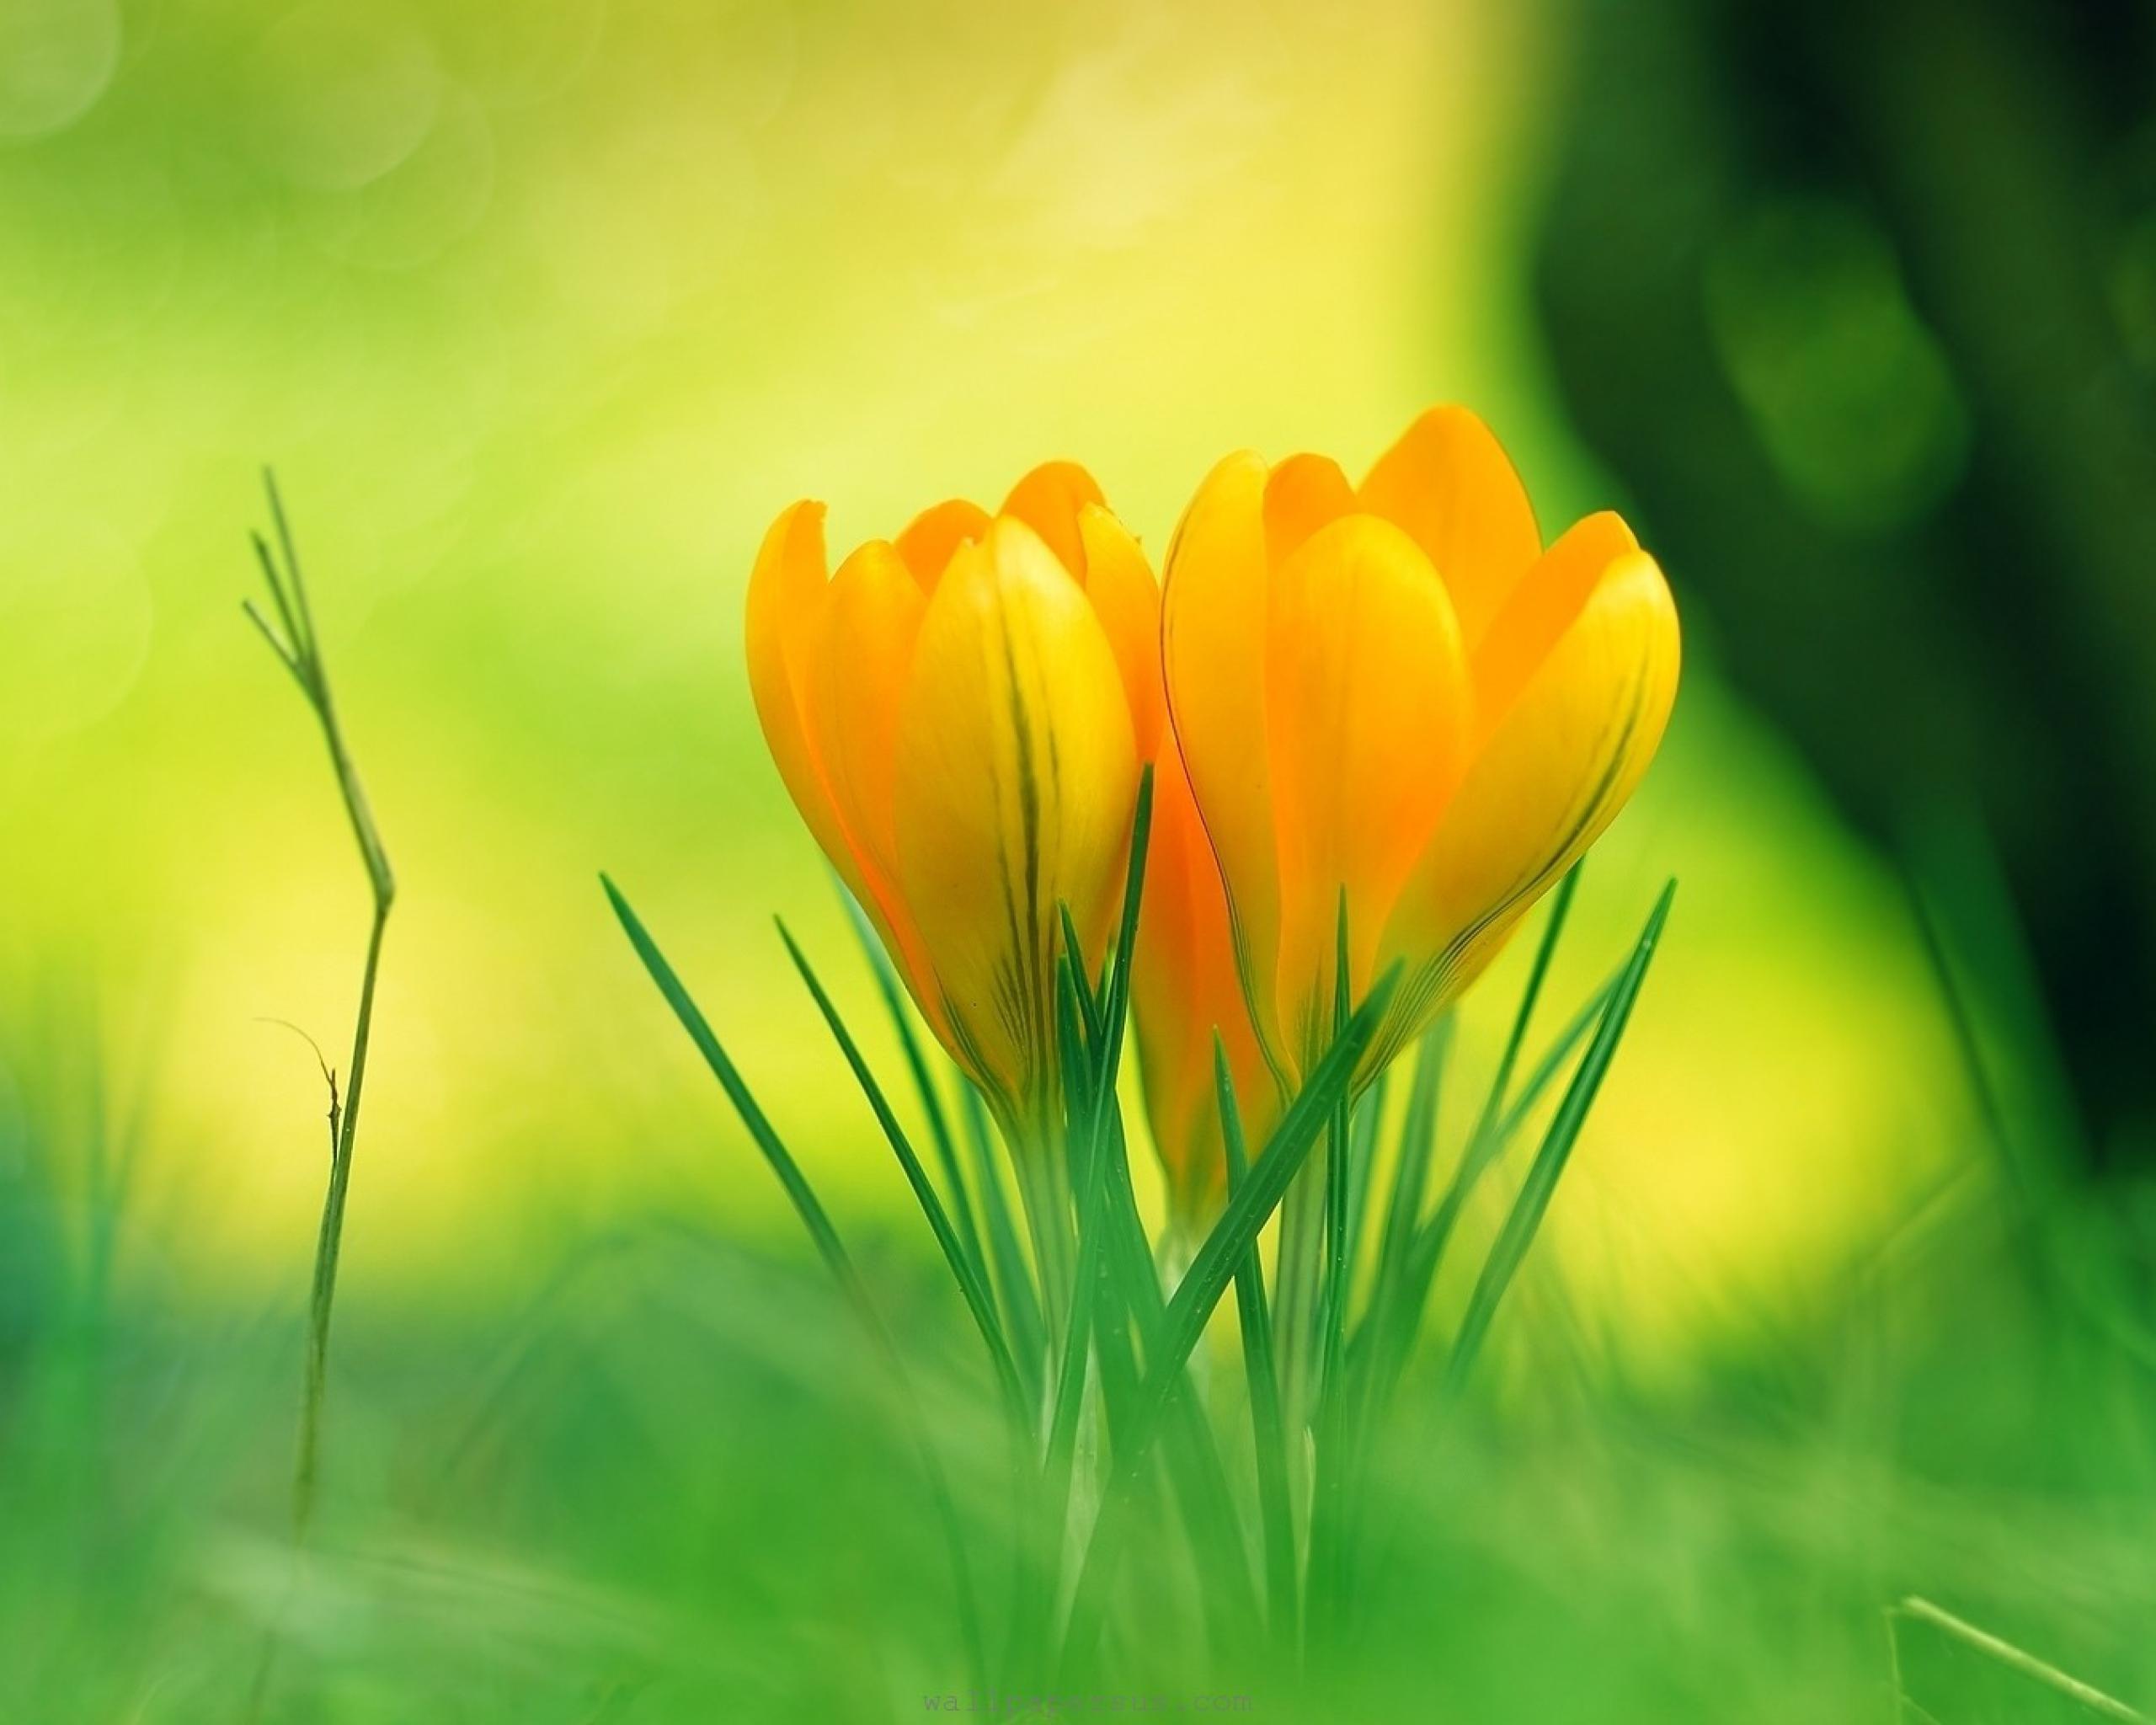 Green Flowers Natural Free Wallpaper